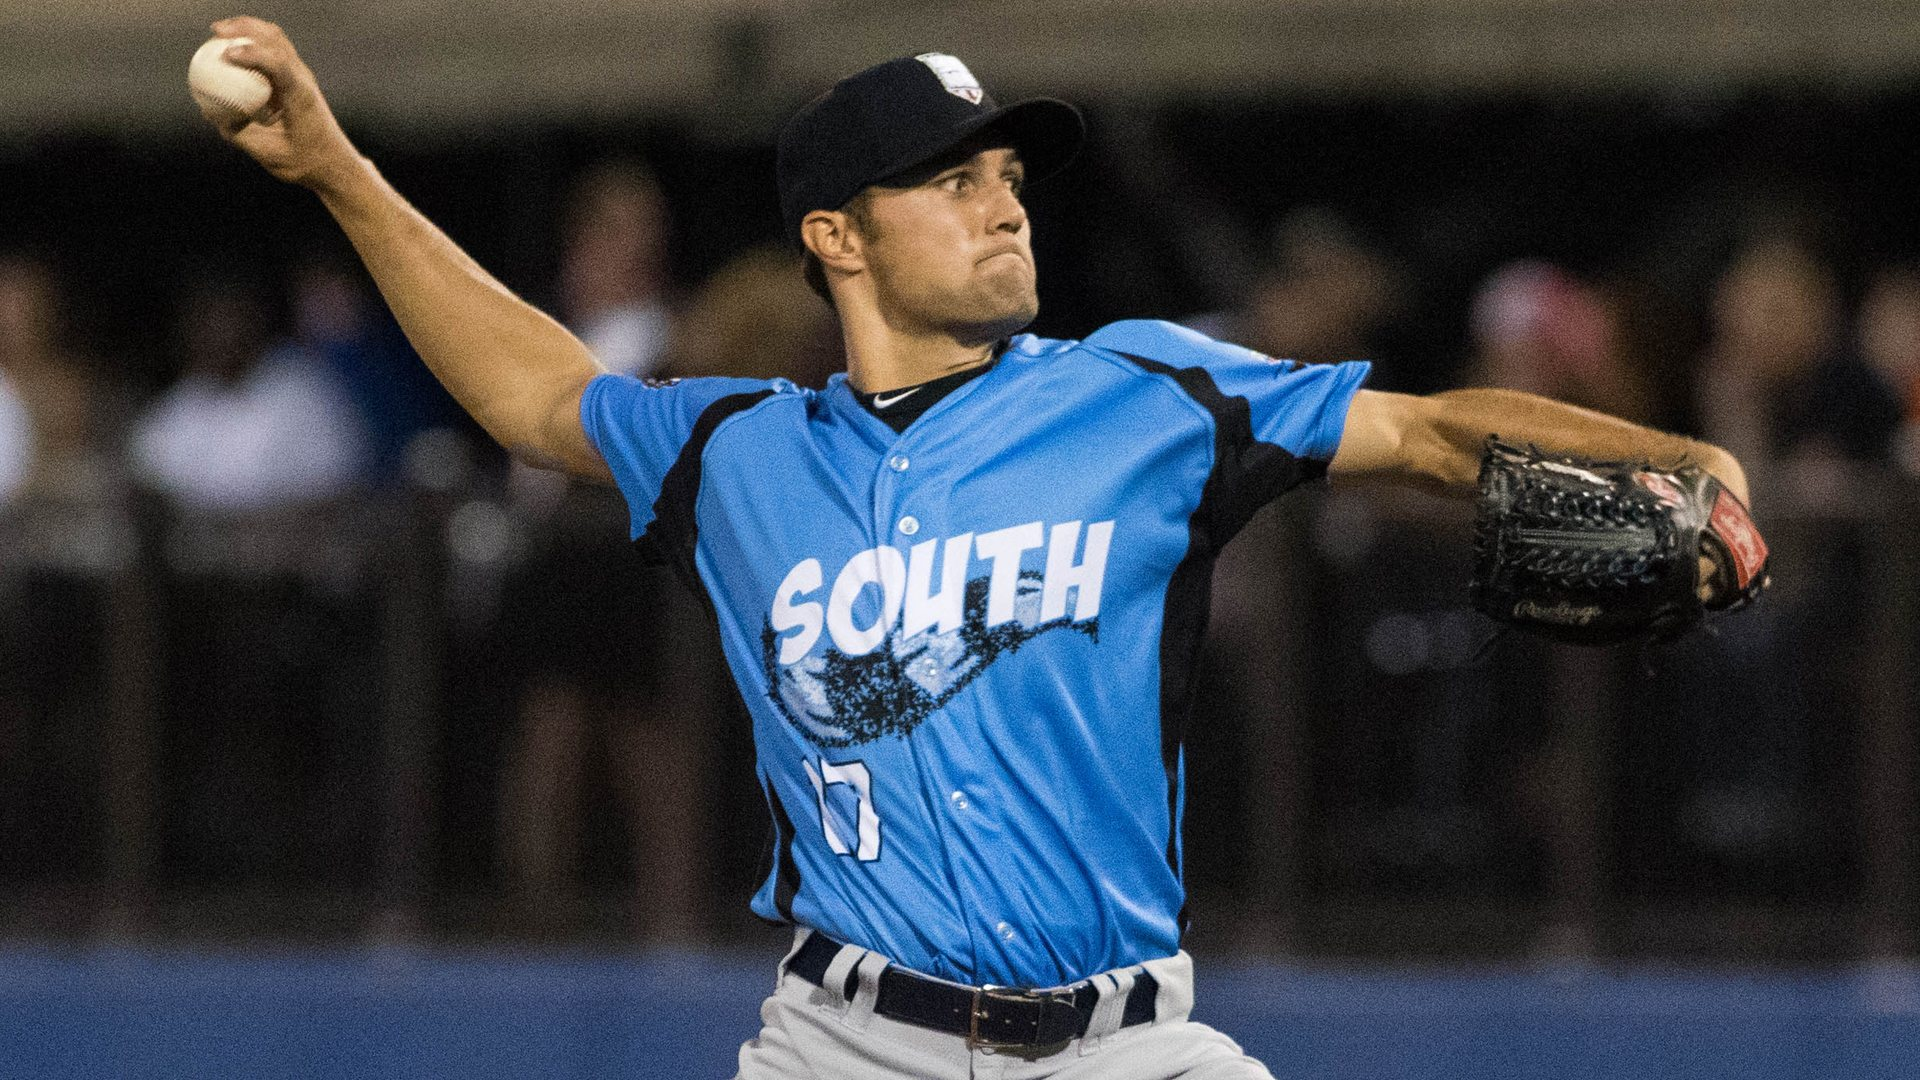 Kolton Mahoney (Allyson White/Staten Island Yankees)